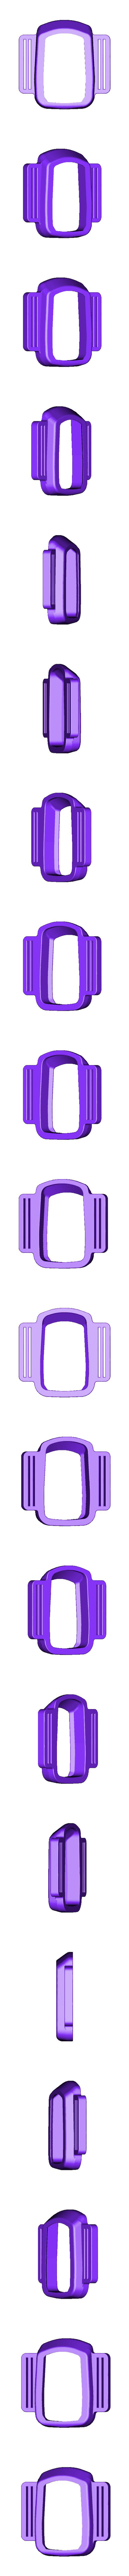 dexcom_G4_G5_cover.stl Descargar archivo STL gratis Dexcom G4/G5 cover • Diseño para la impresora 3D, martincollar